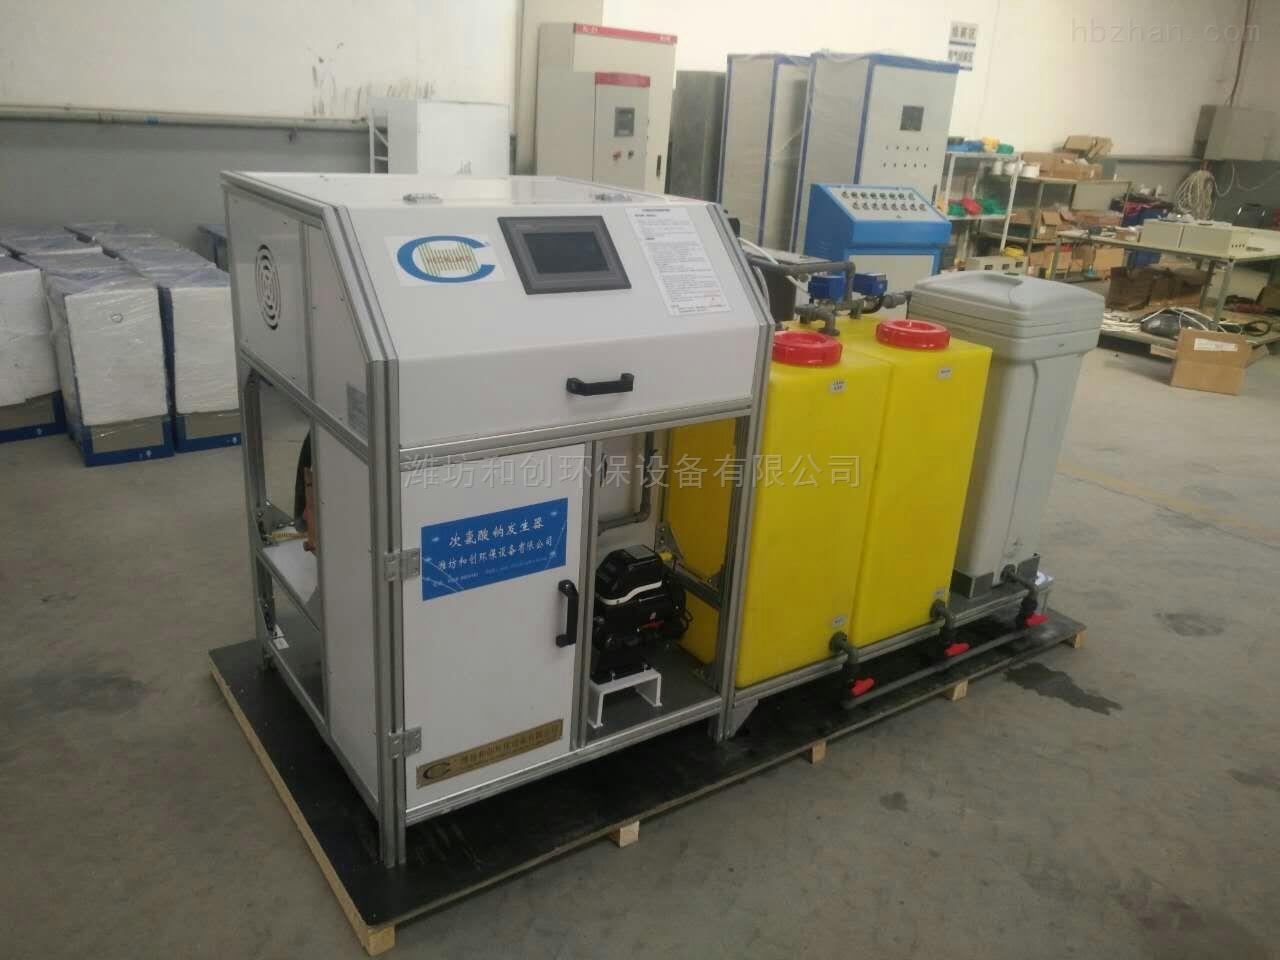 500g次氯酸钠发生器电解食盐消毒系统